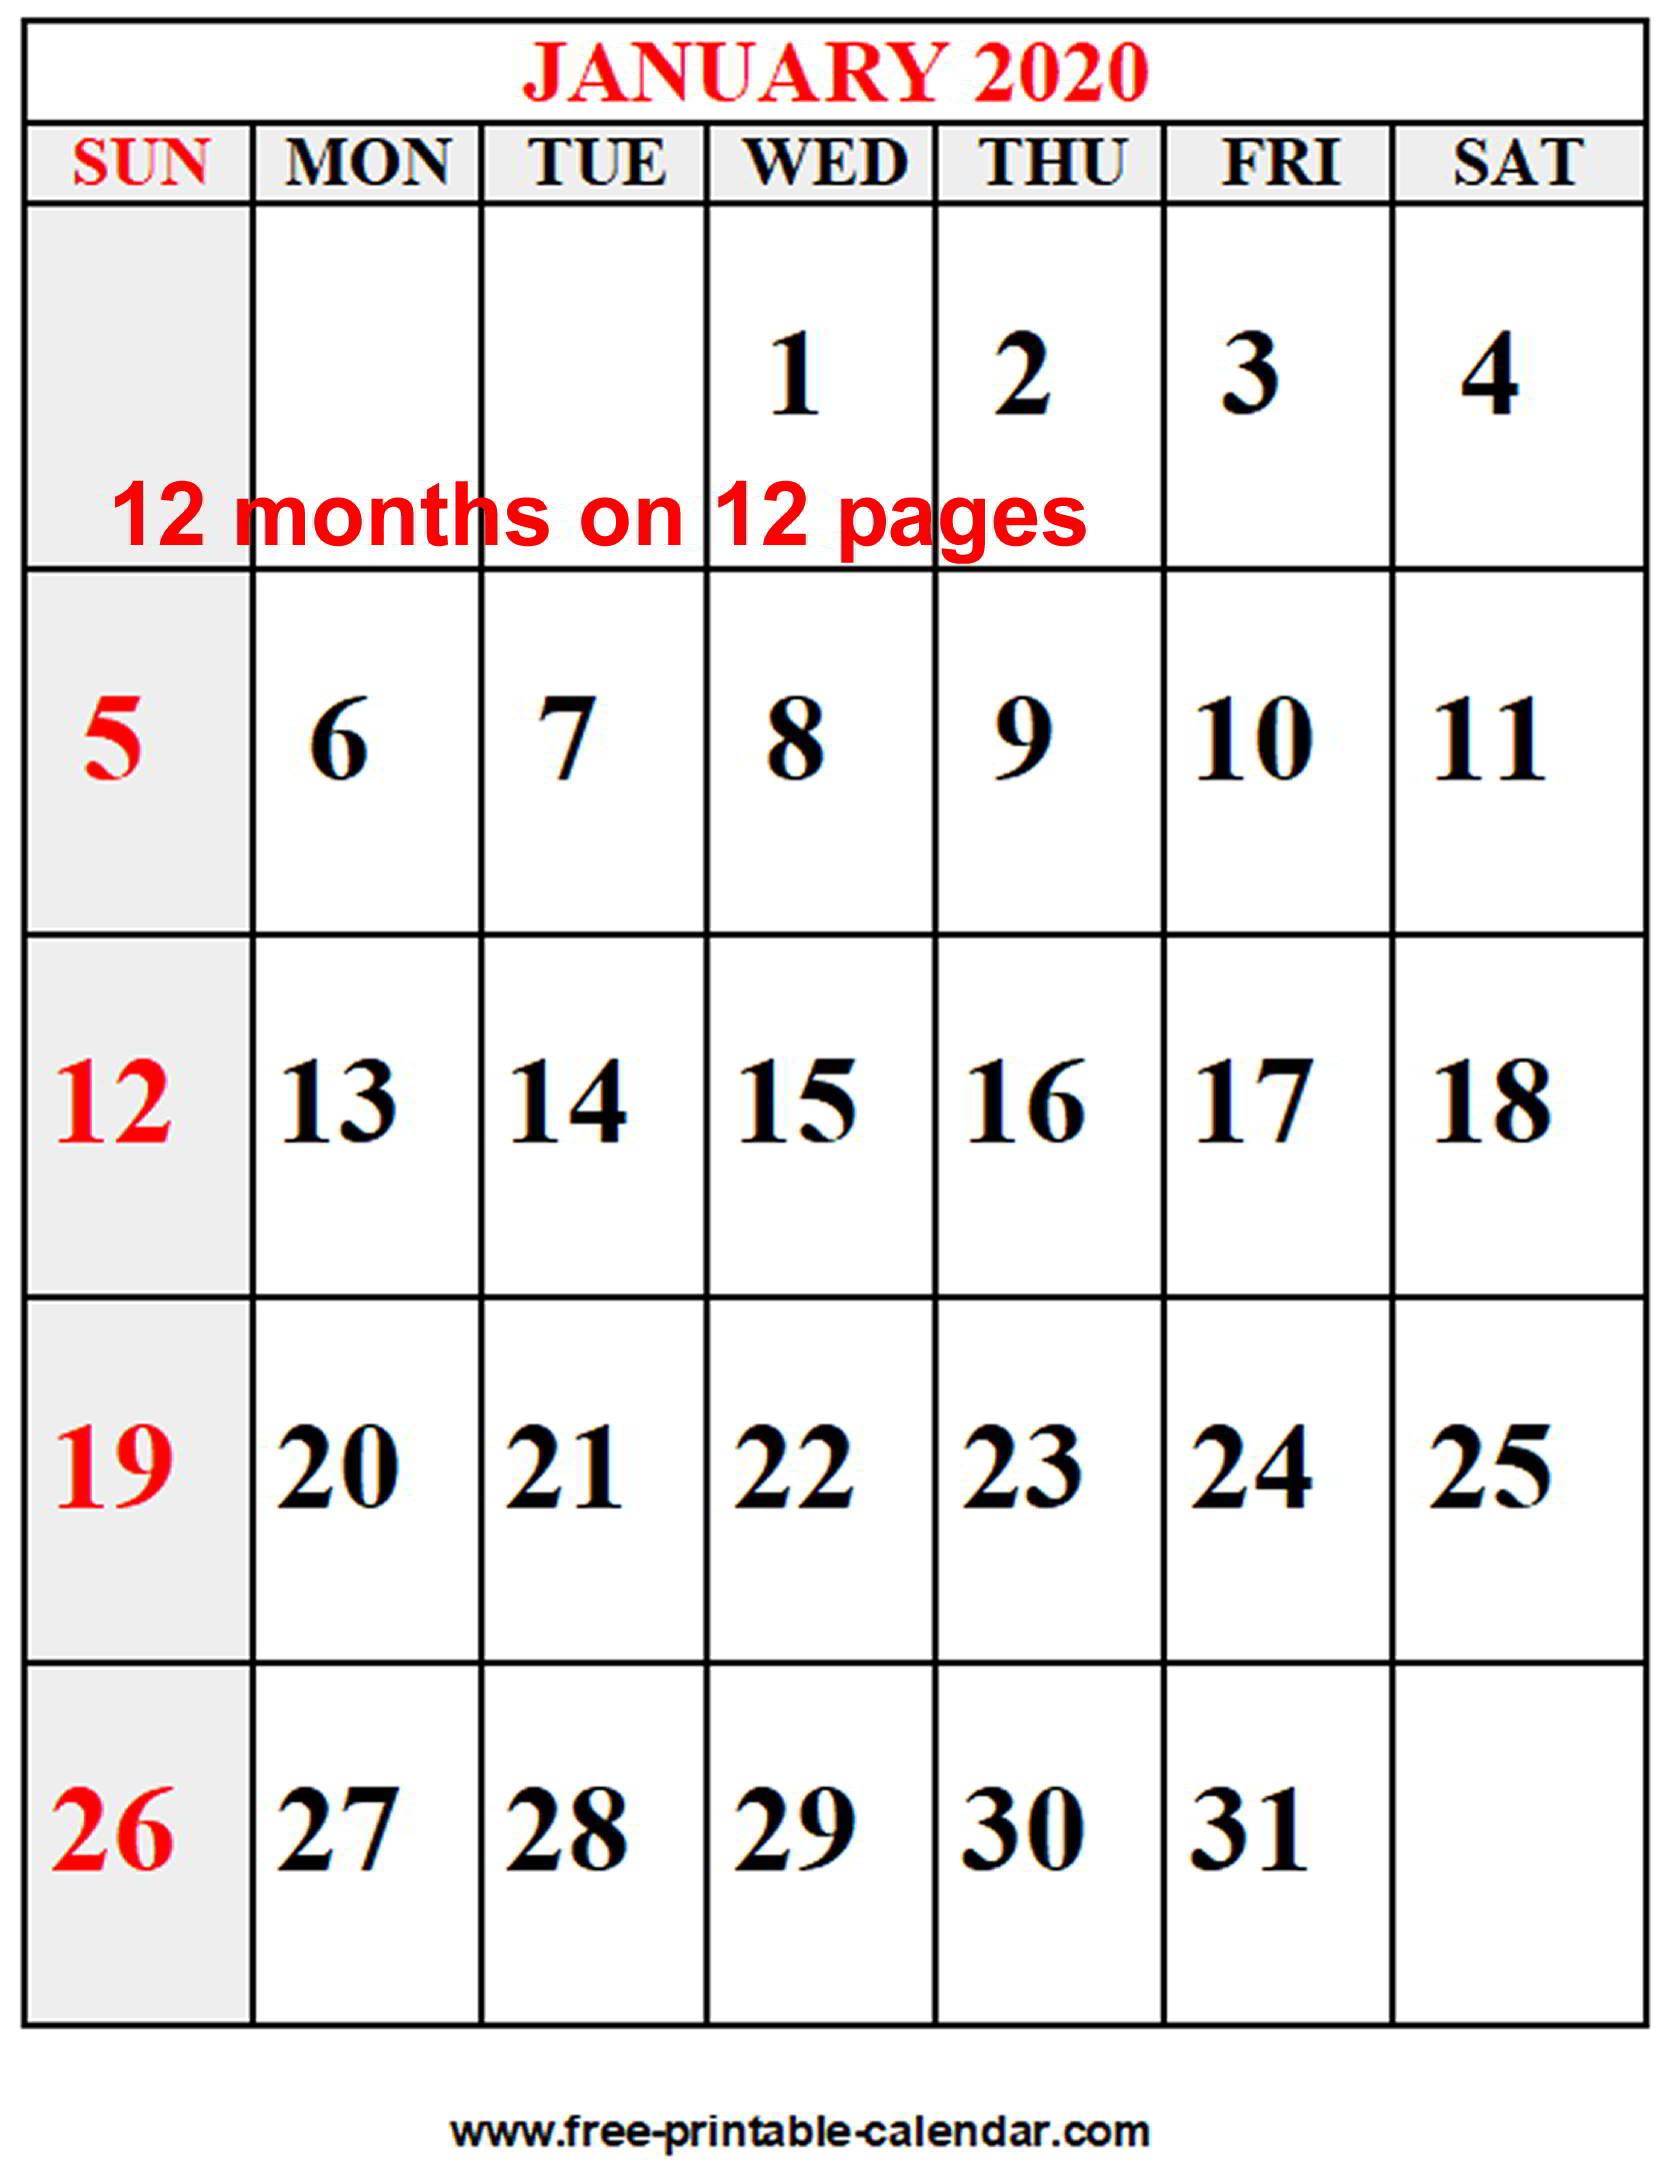 Year 2020 Calendar - Free-Printable-Calendar